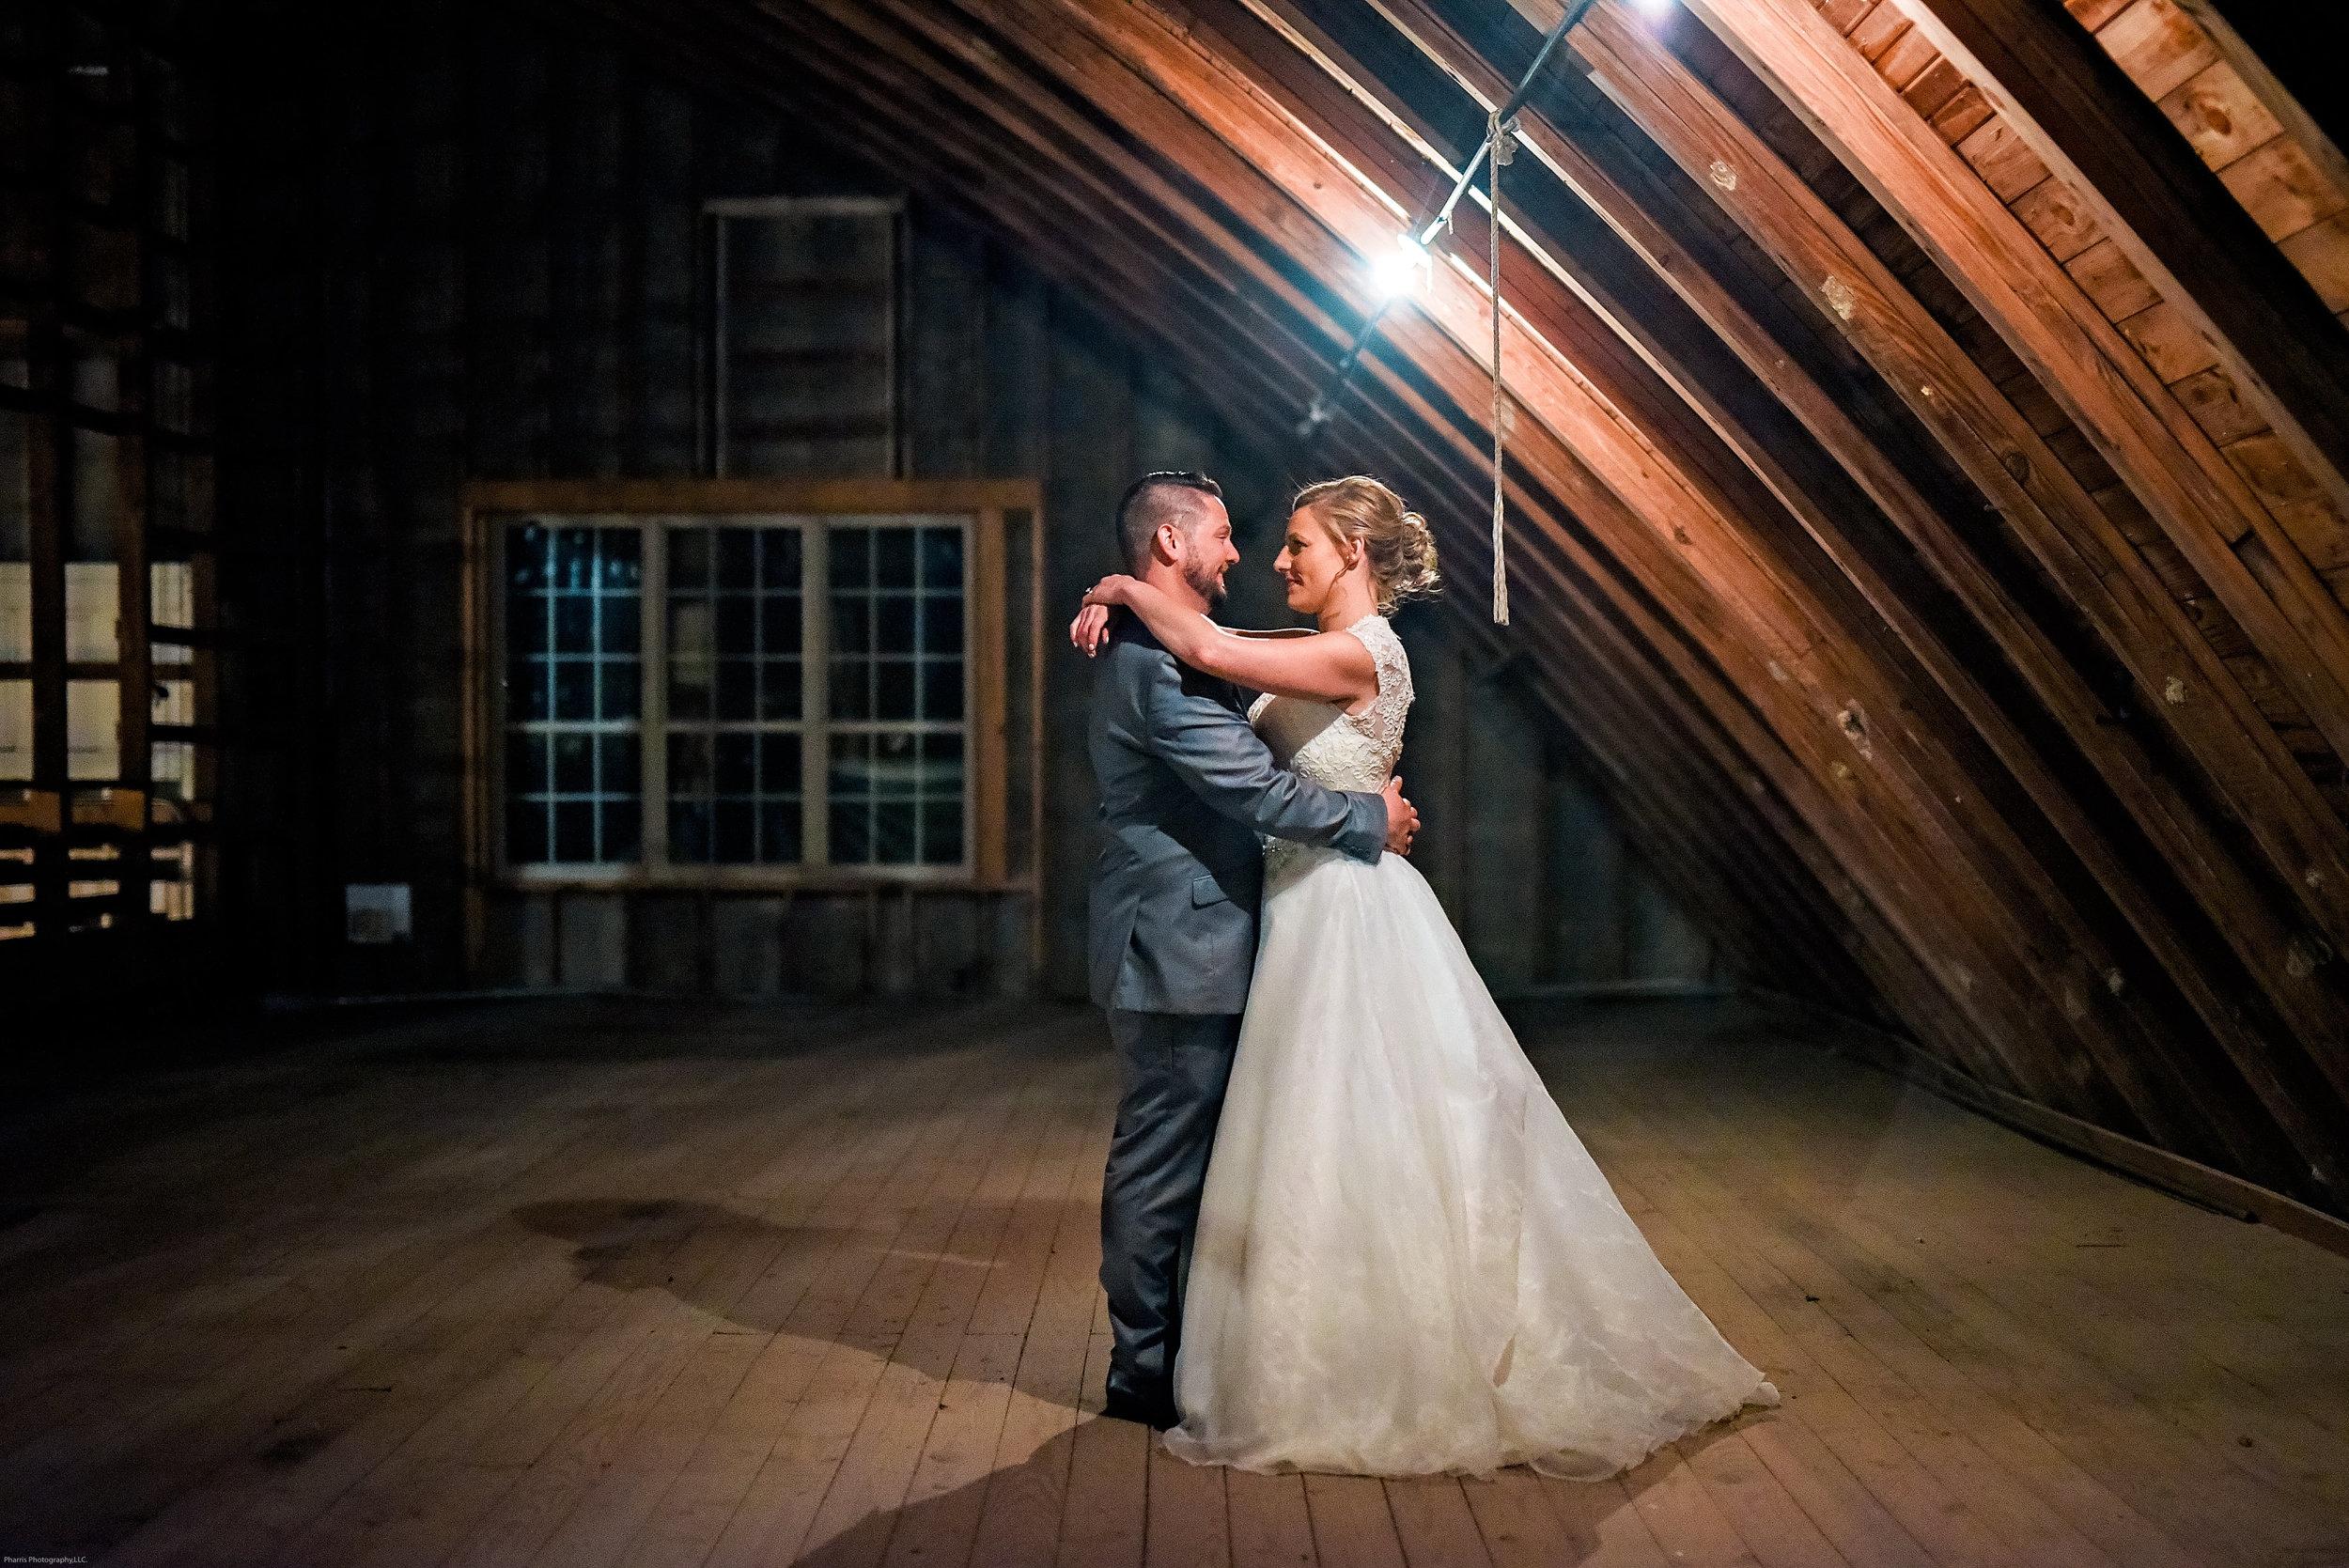 Taylor-Mallorie-Wedding-Pharris-Photos-0123.jpg